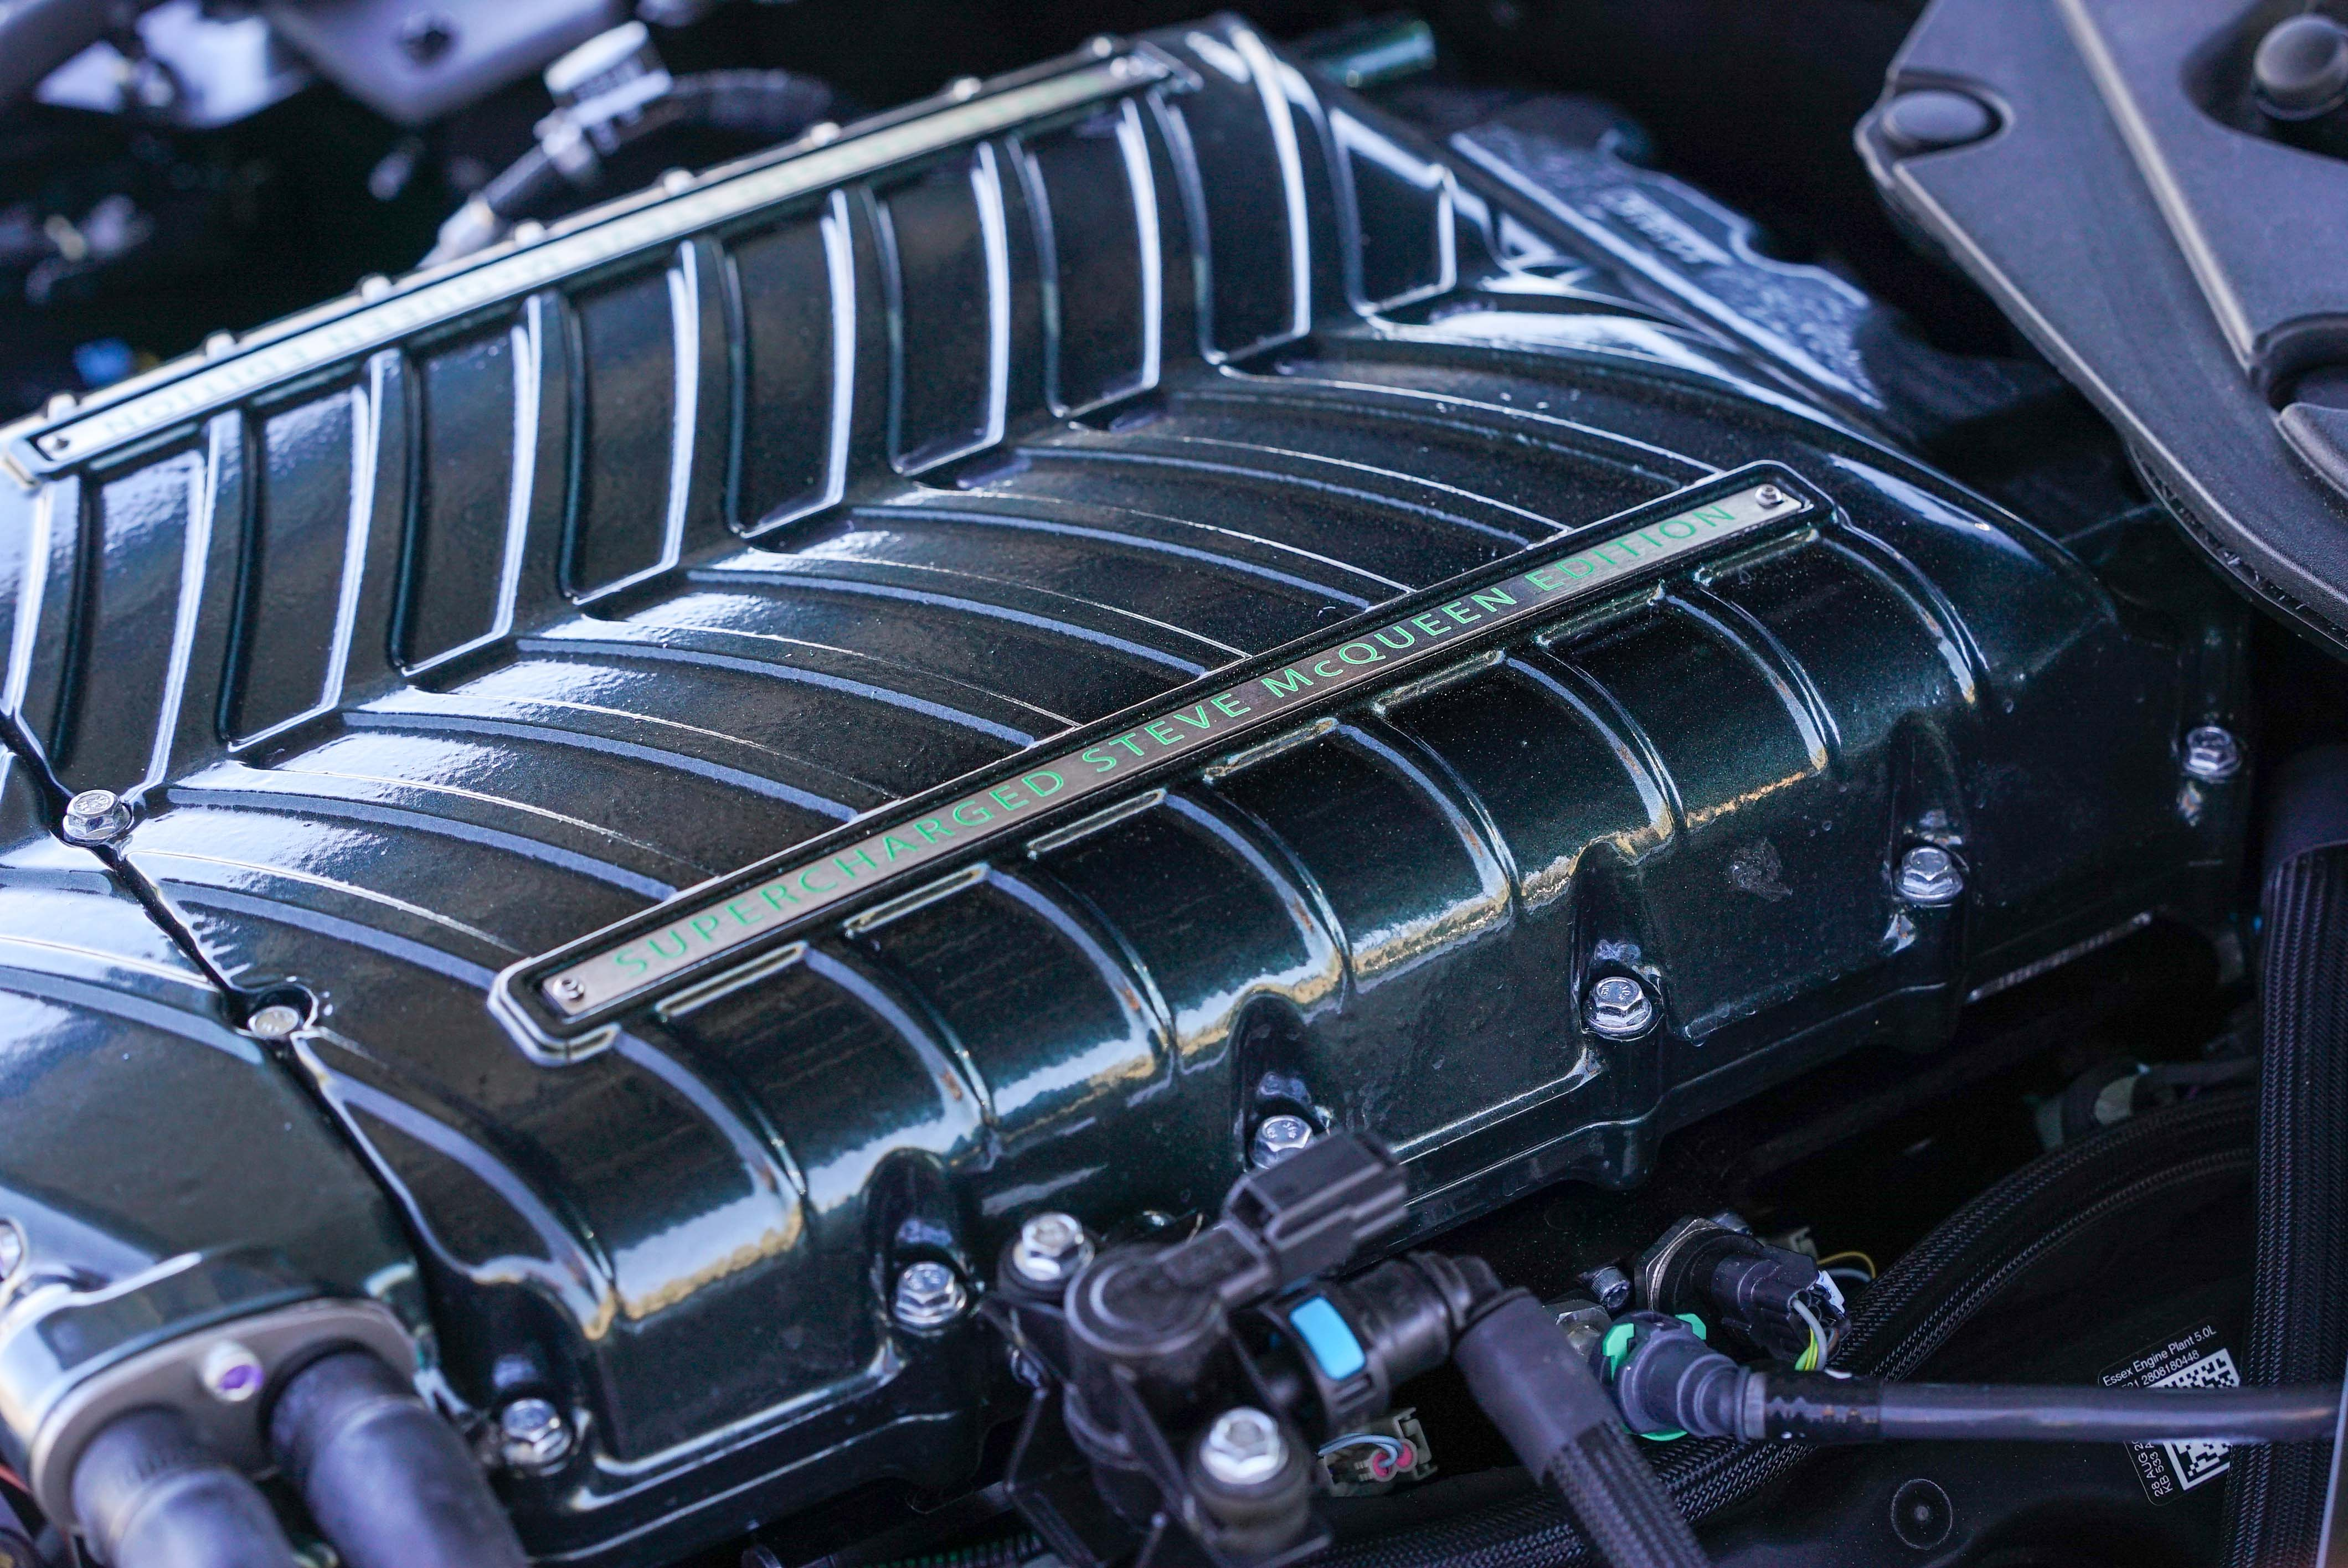 Supercharged powertrain boasts 775hp